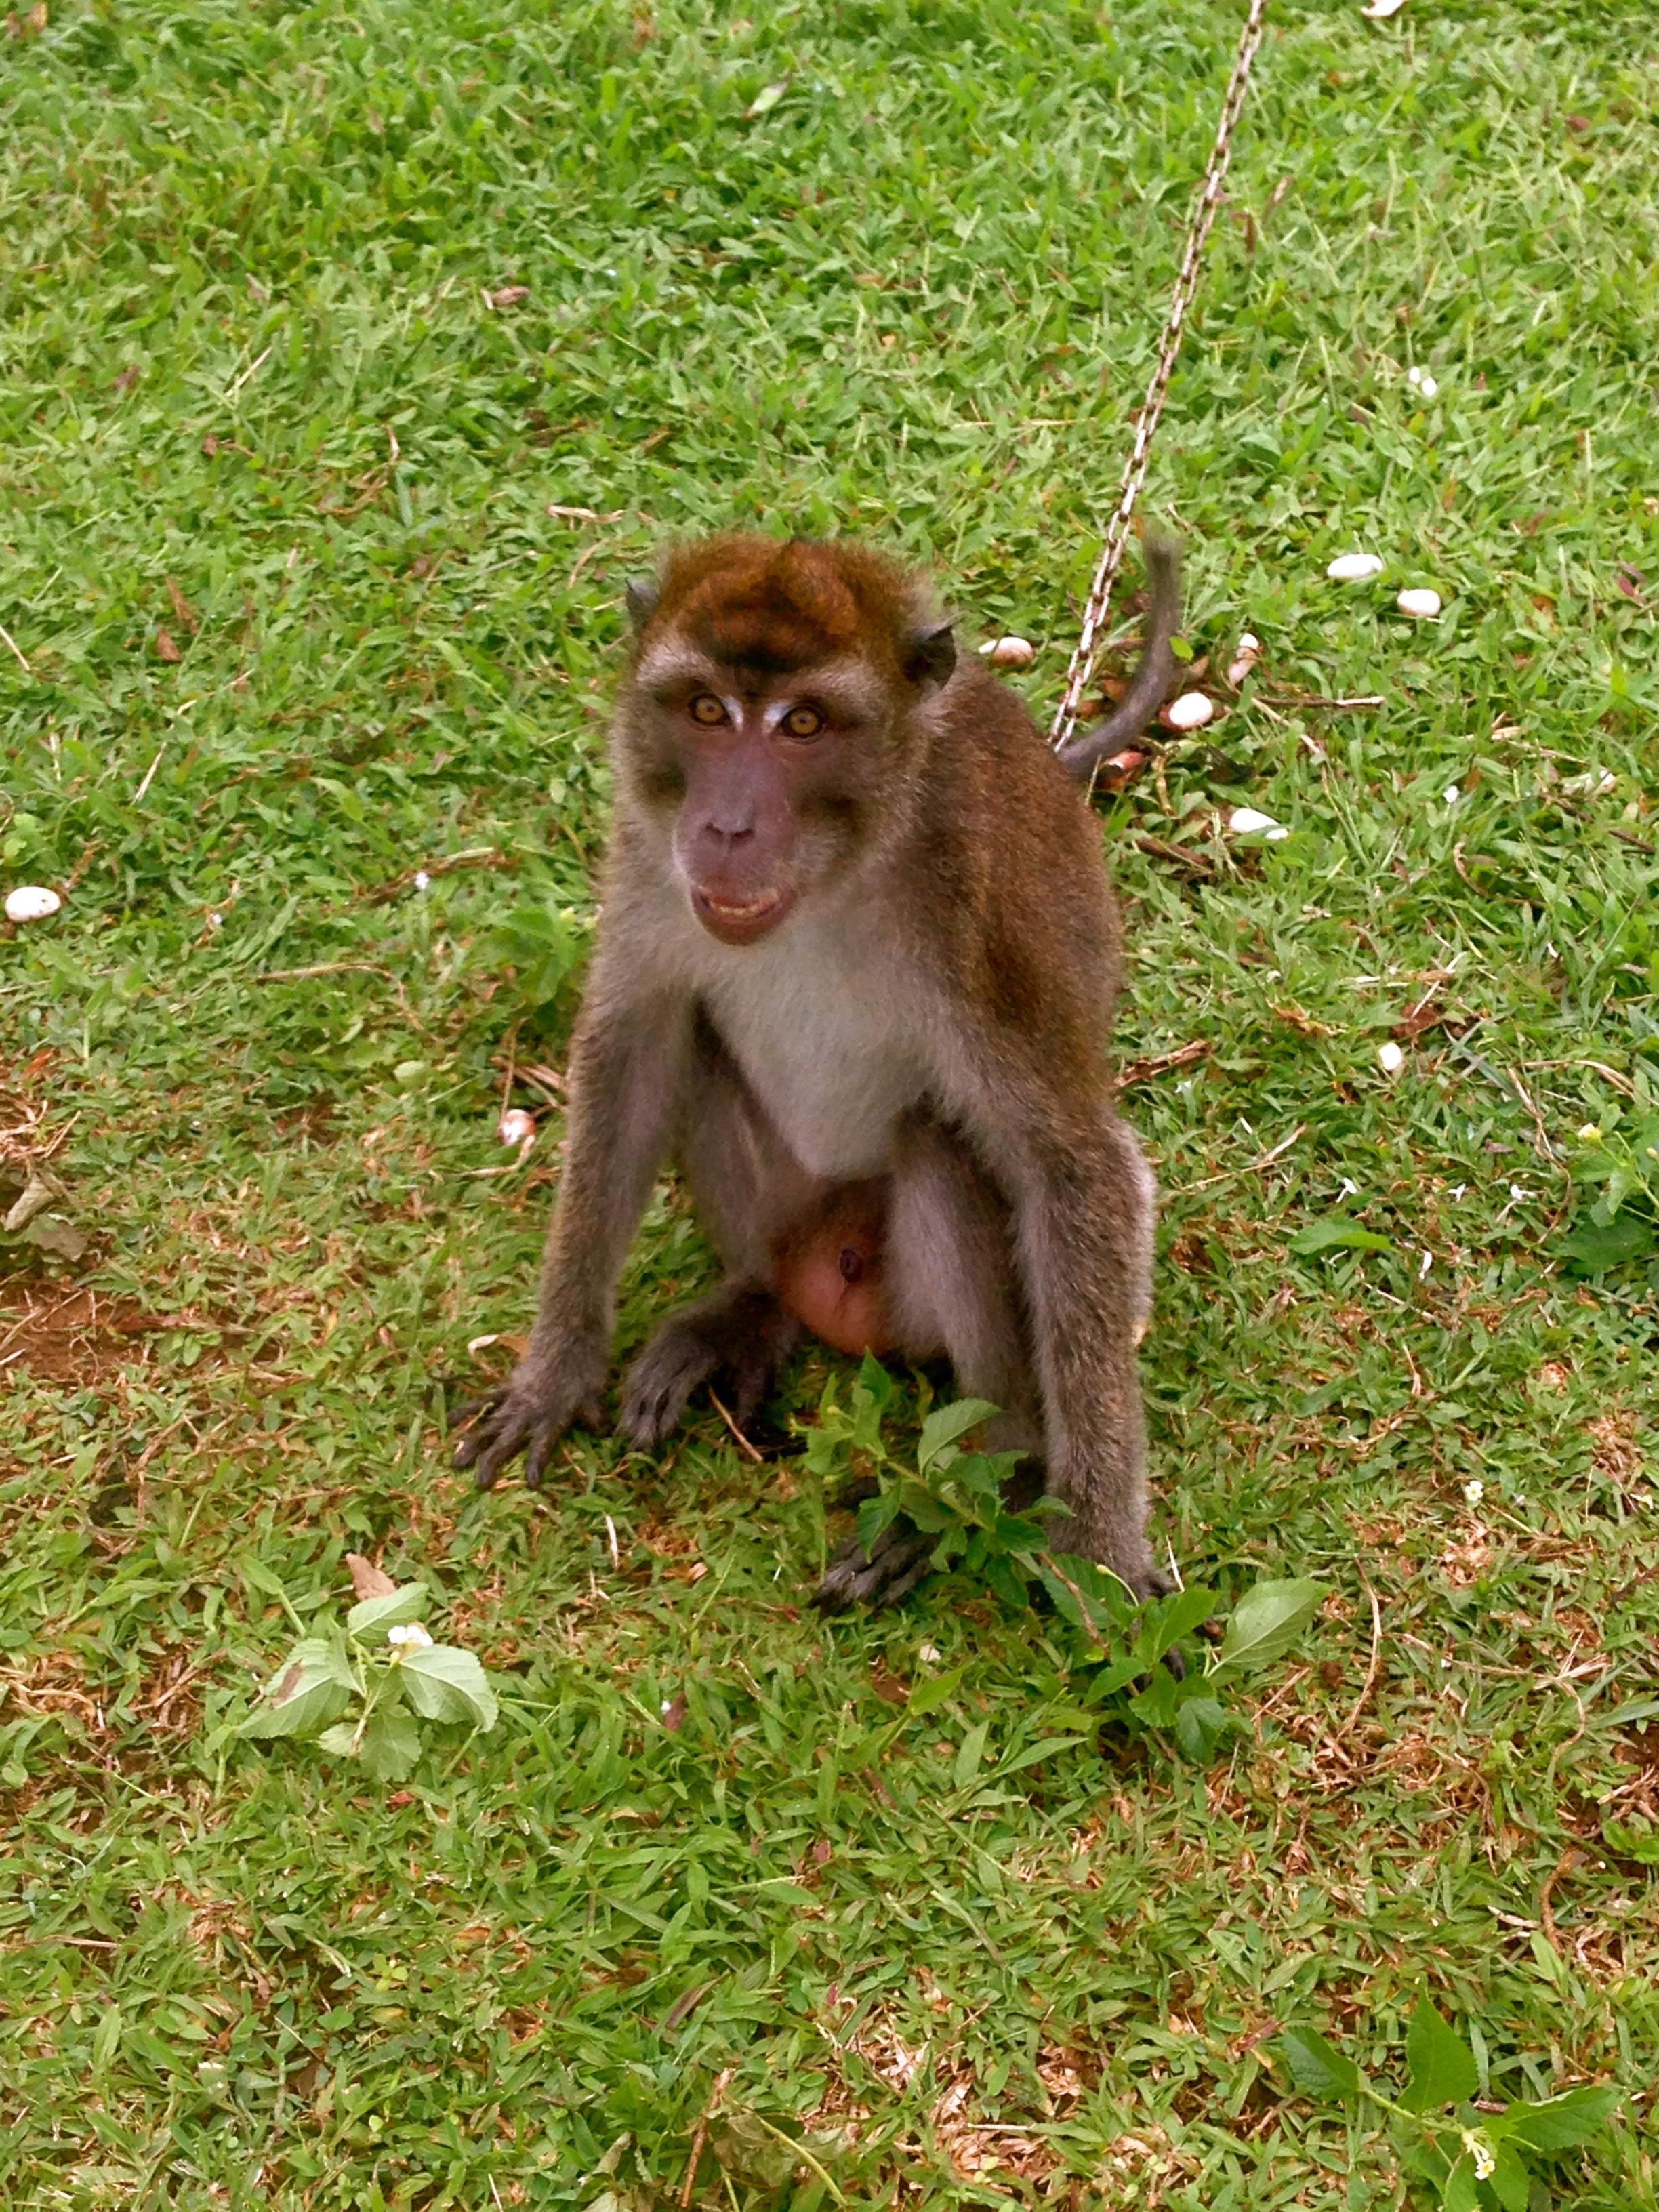 The grumpy Monkey